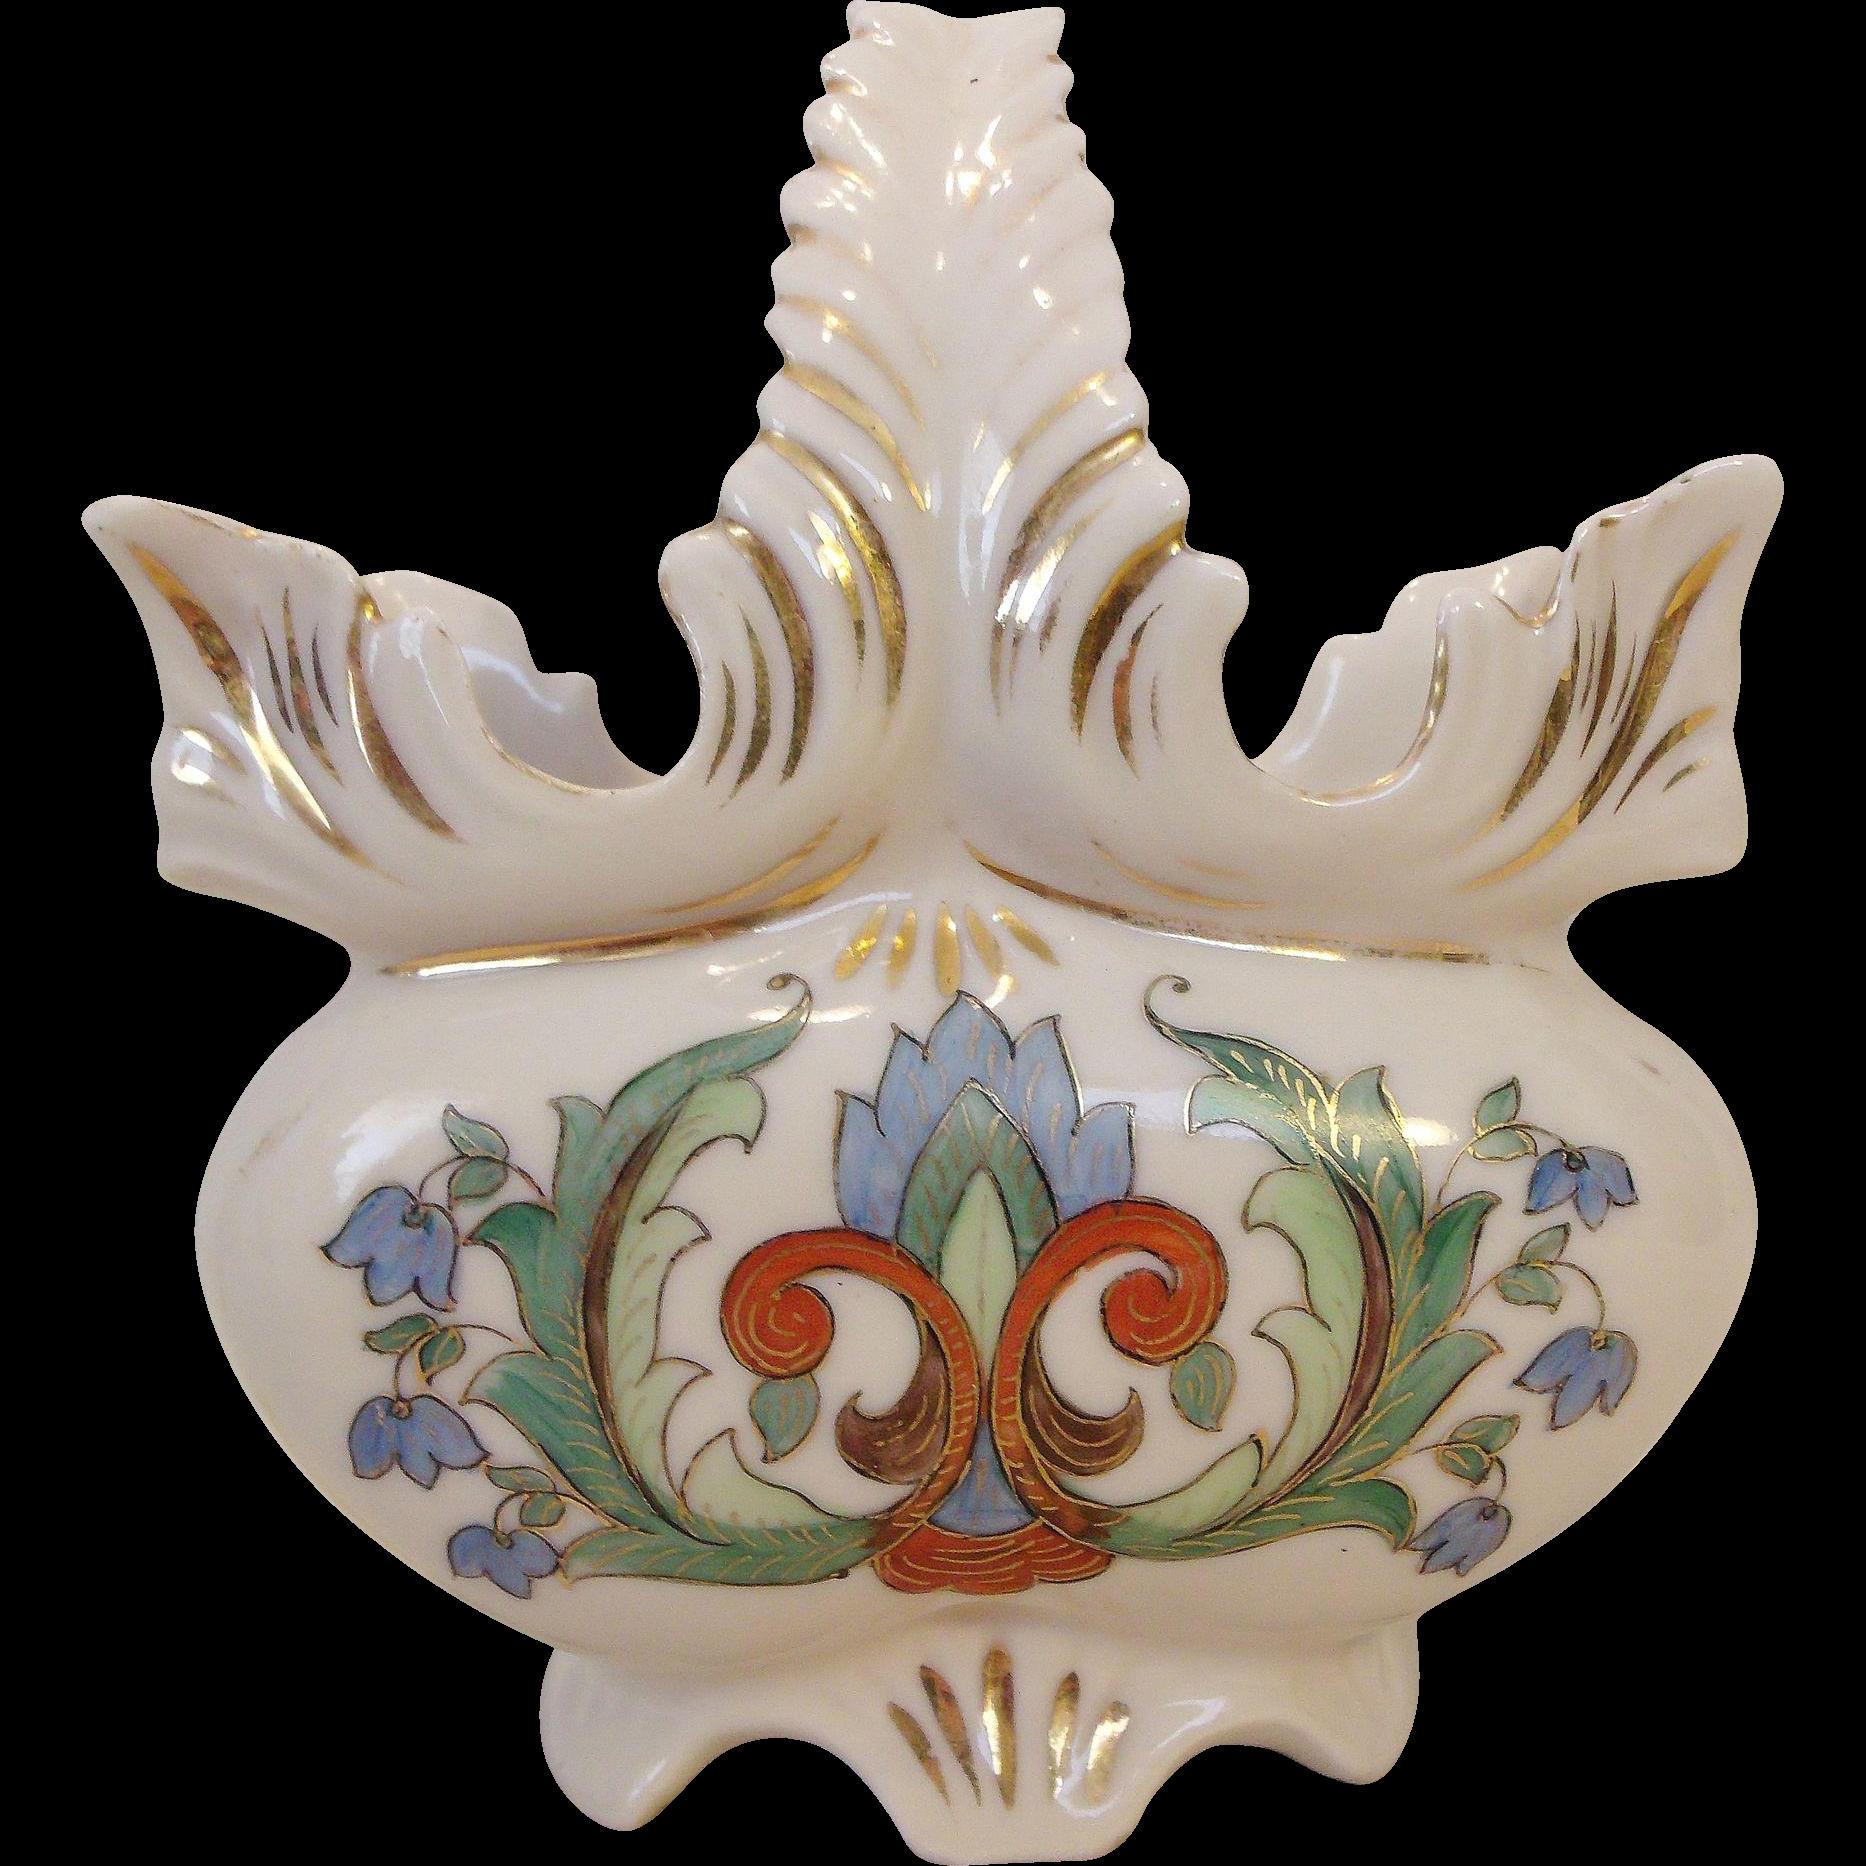 Fantastic Old Creamware Basket Hand Painted Beauty